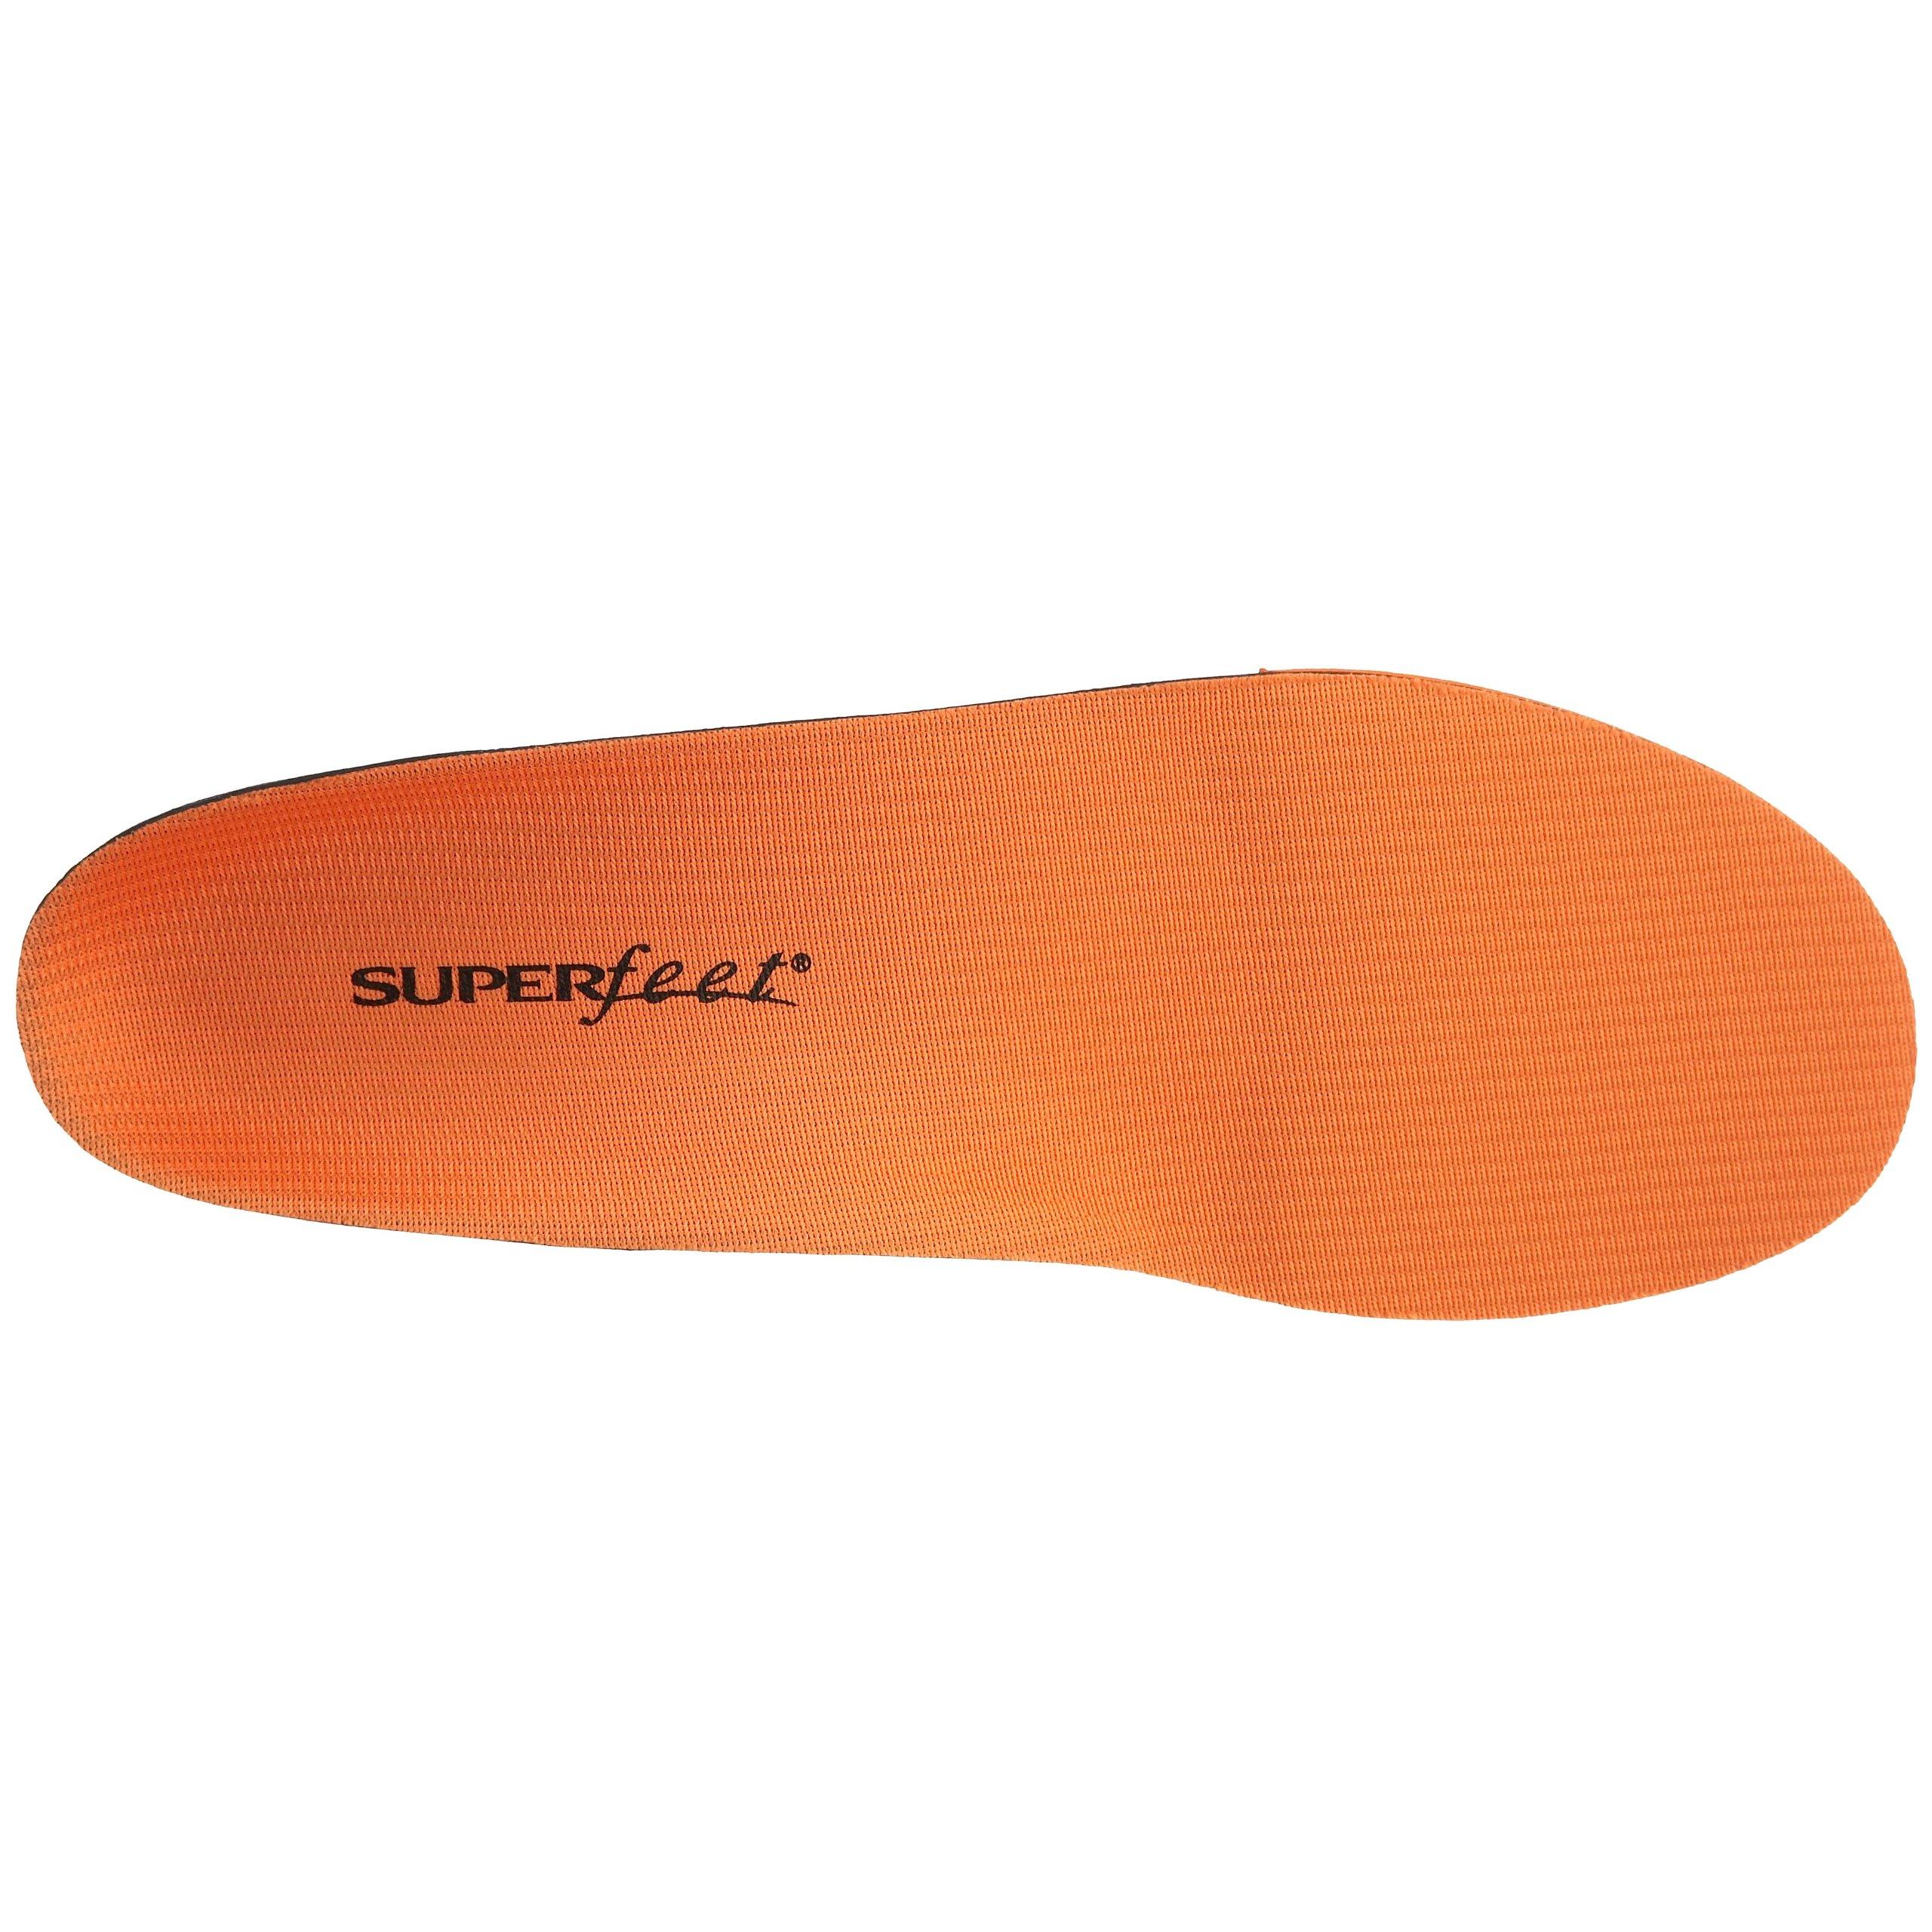 Superfeet Men's Orange Premium Insoles,Orange,C: 5.5-7 US Mens by Superfeet (Image #7)